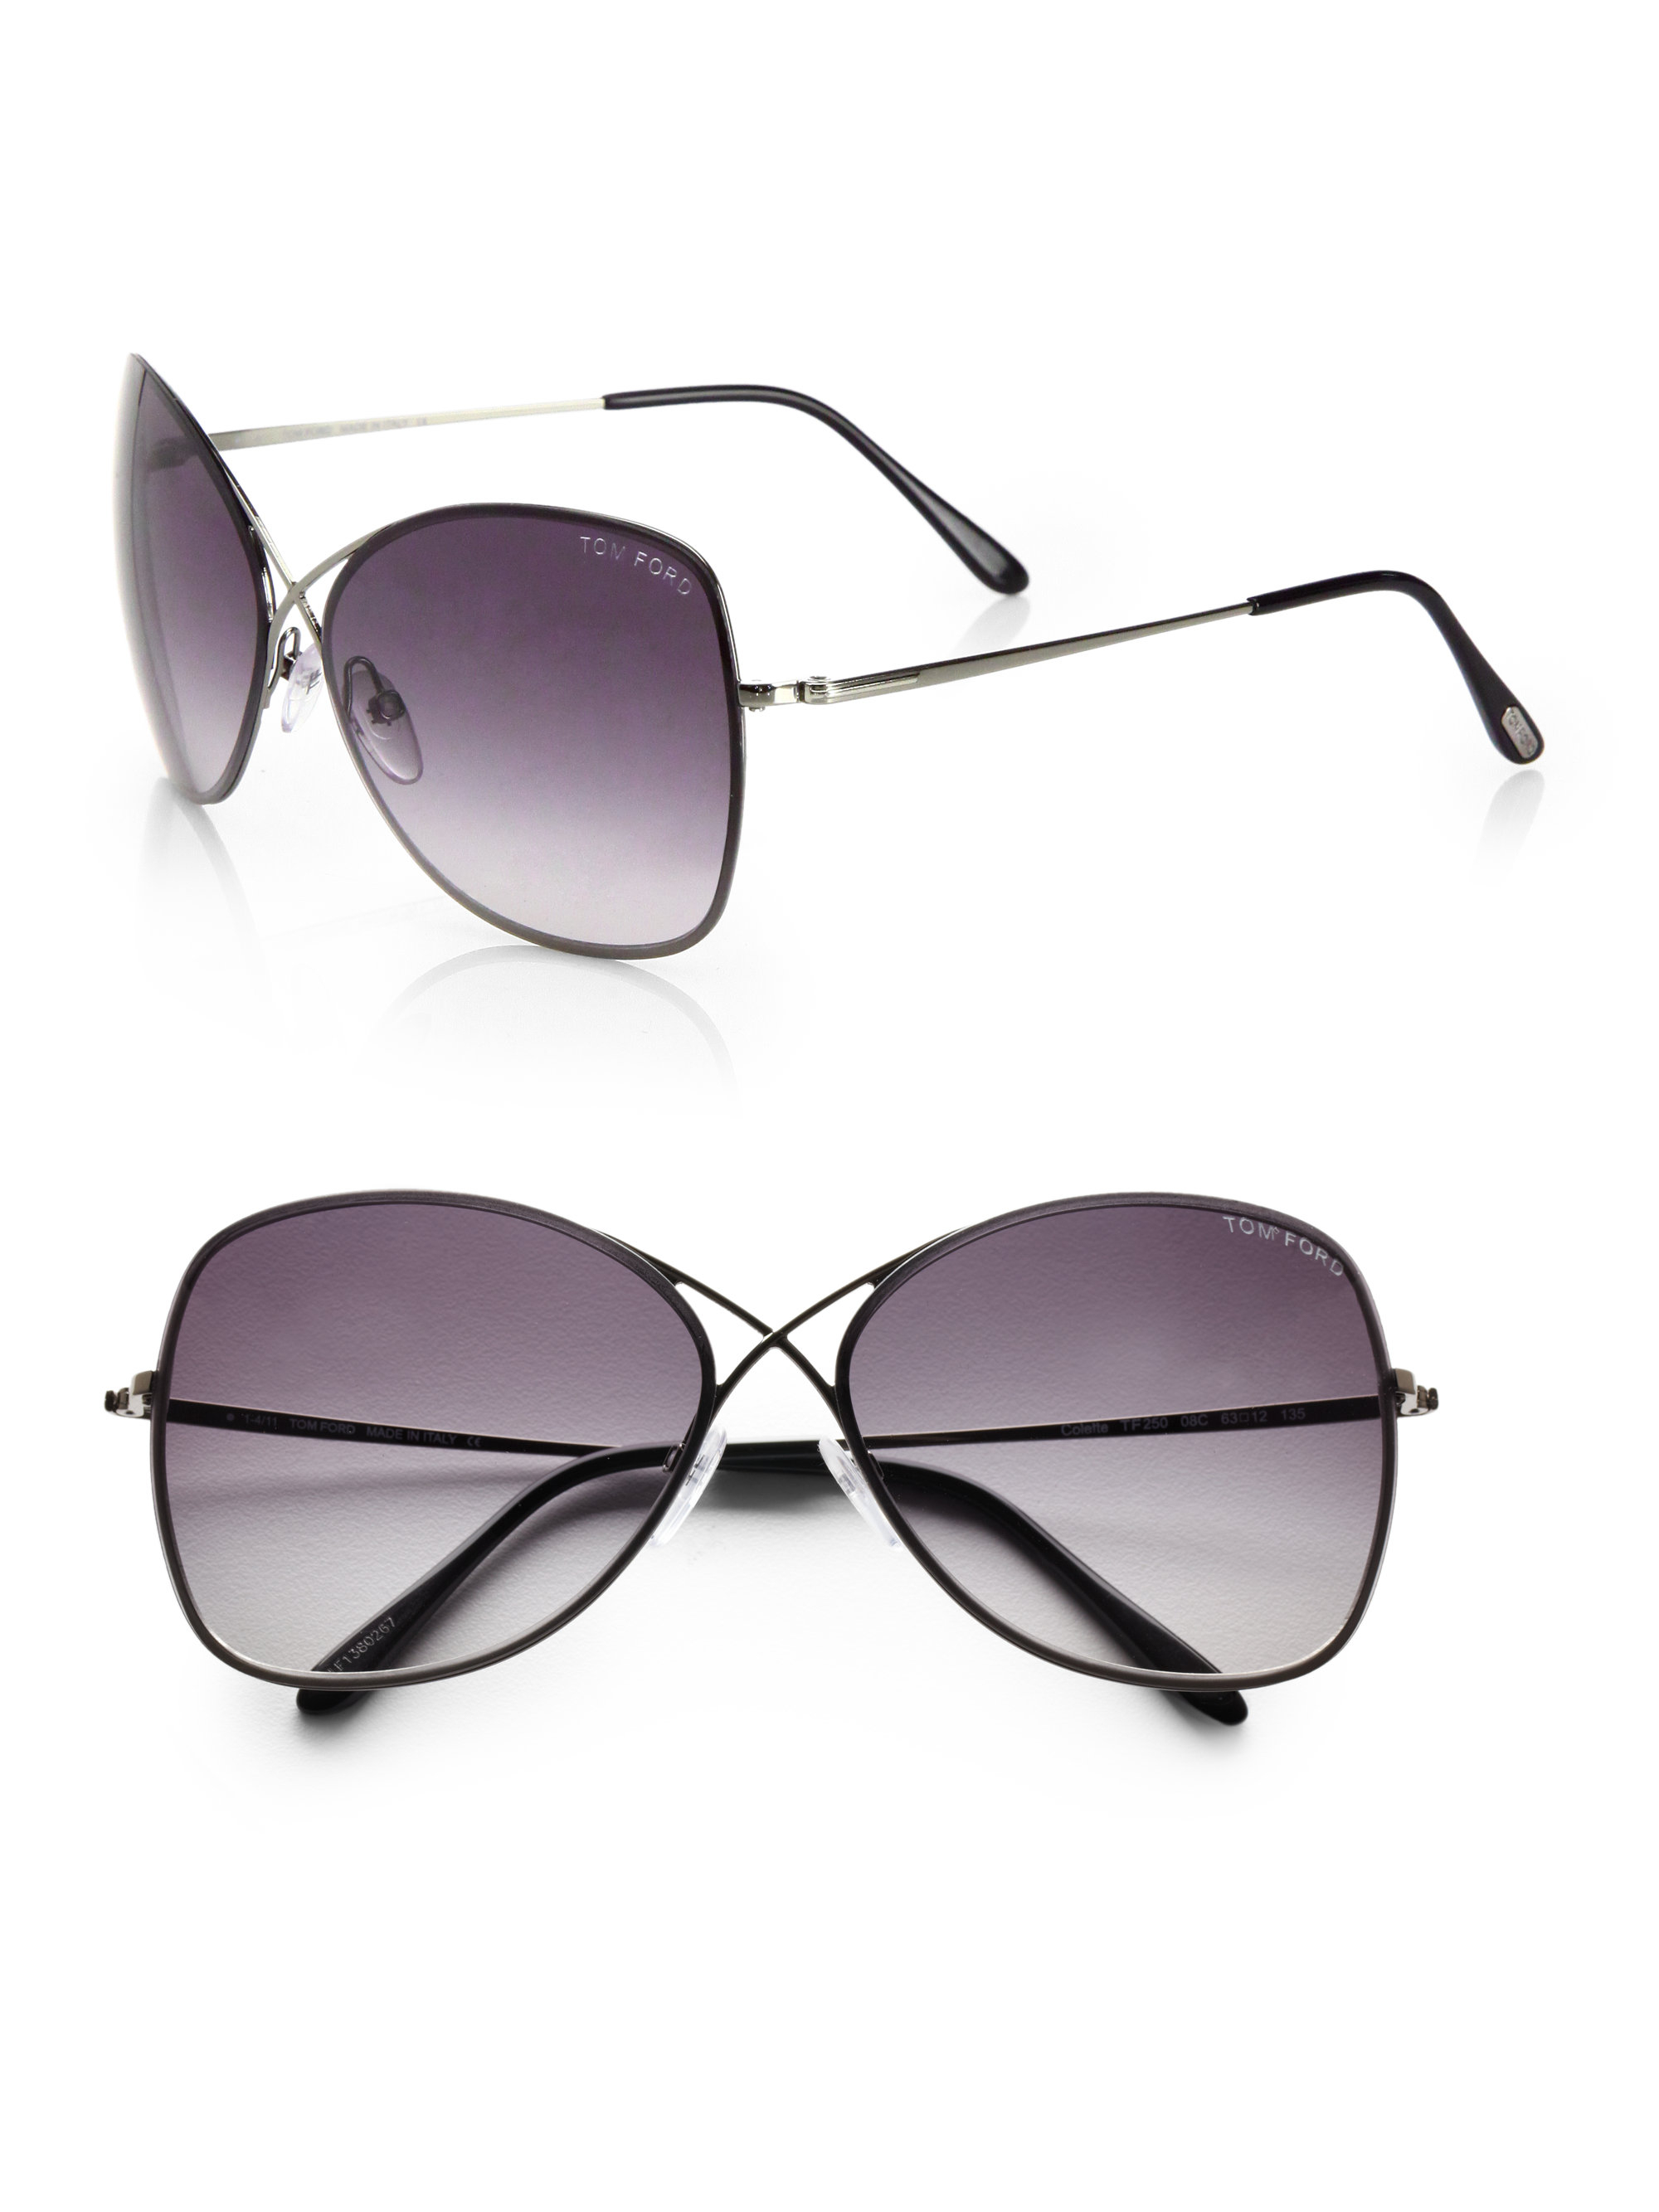 Tom Ford Colette Rimless Oversized Aviator Sunglasses in ...